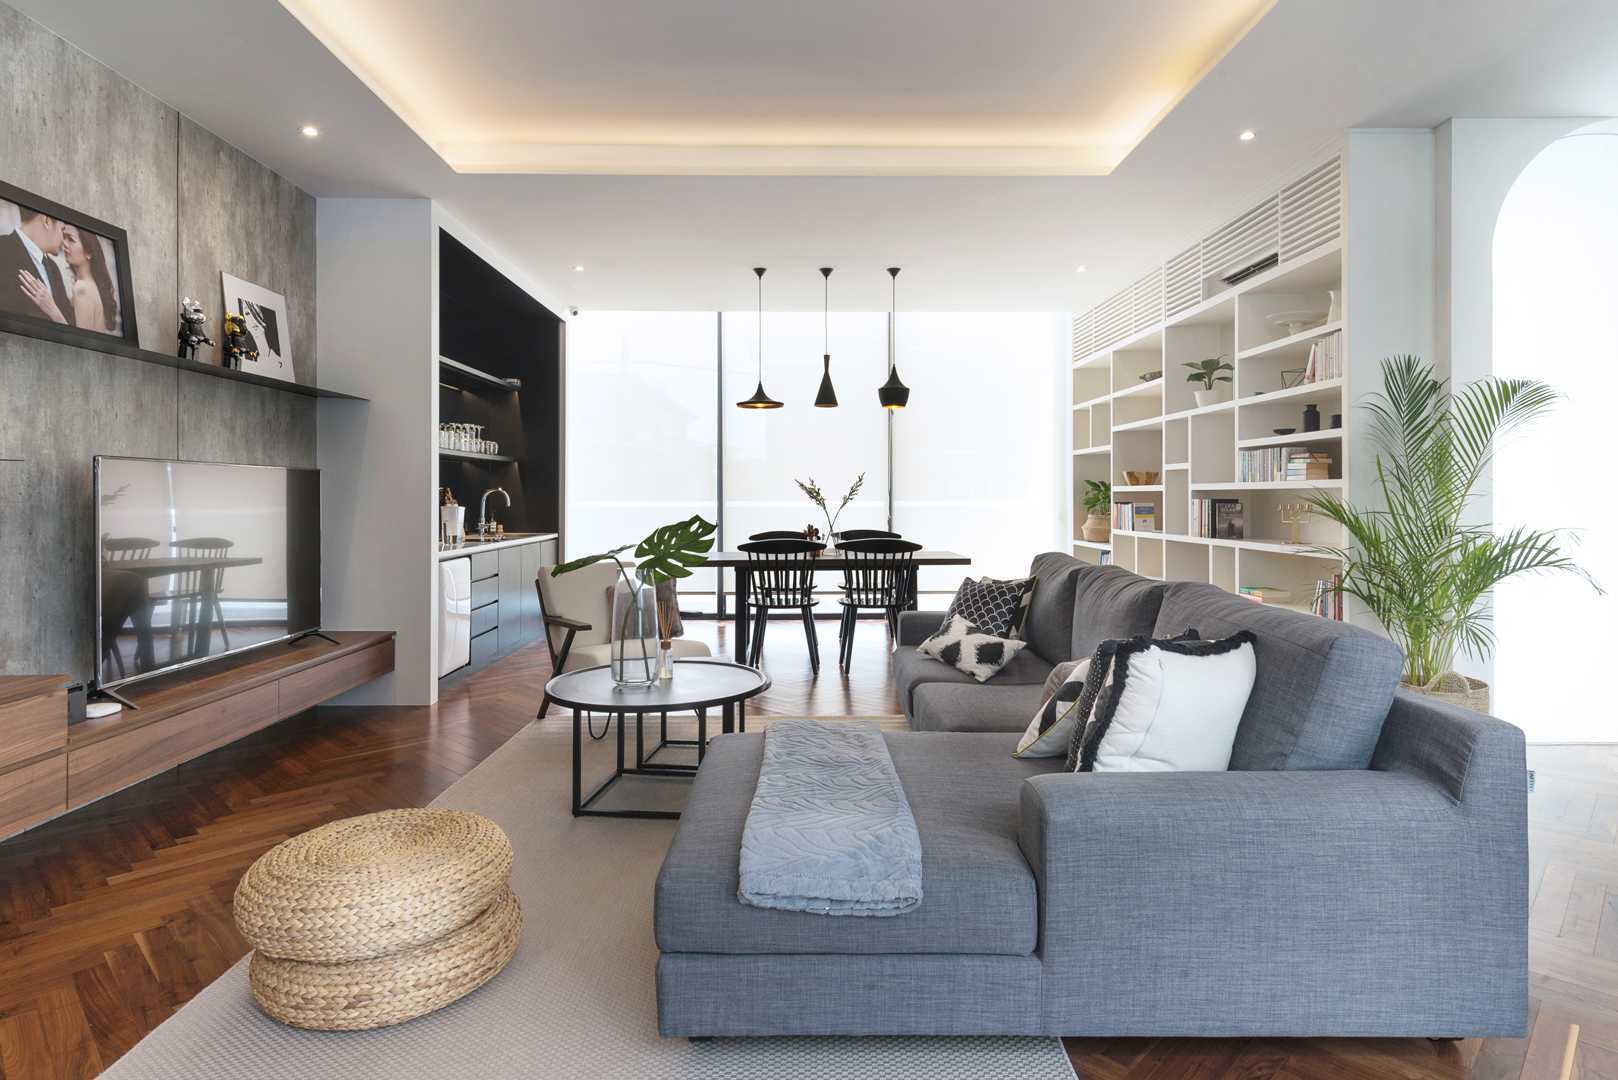 Haliman#02: Desain Interior Rumah Kekinian Kaum Urban yang Stylish | Foto artikel Arsitag